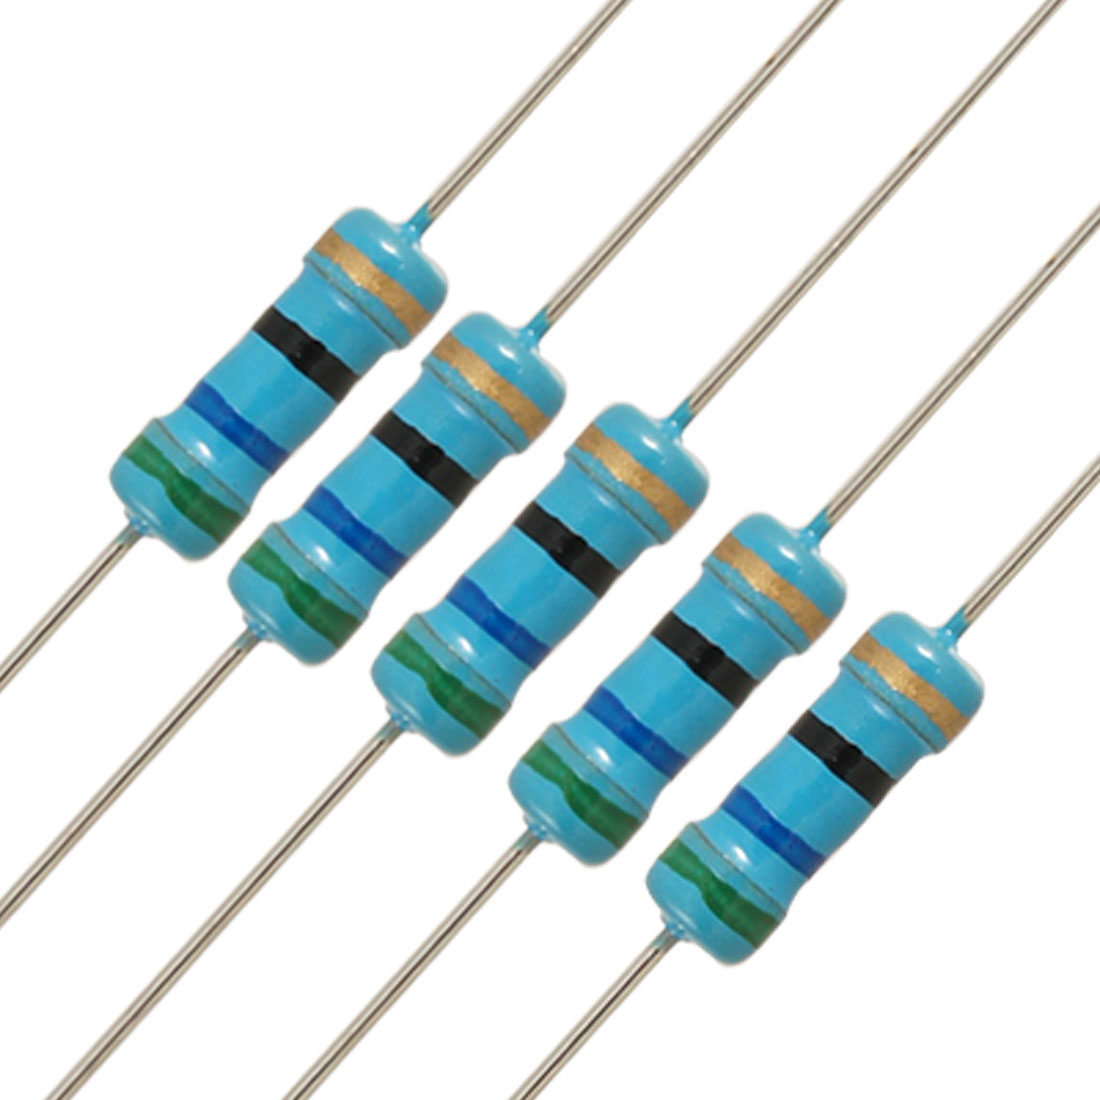 20 x 1/2W Watt 56 ohm 56R Carbon Film Resistor 0.5W